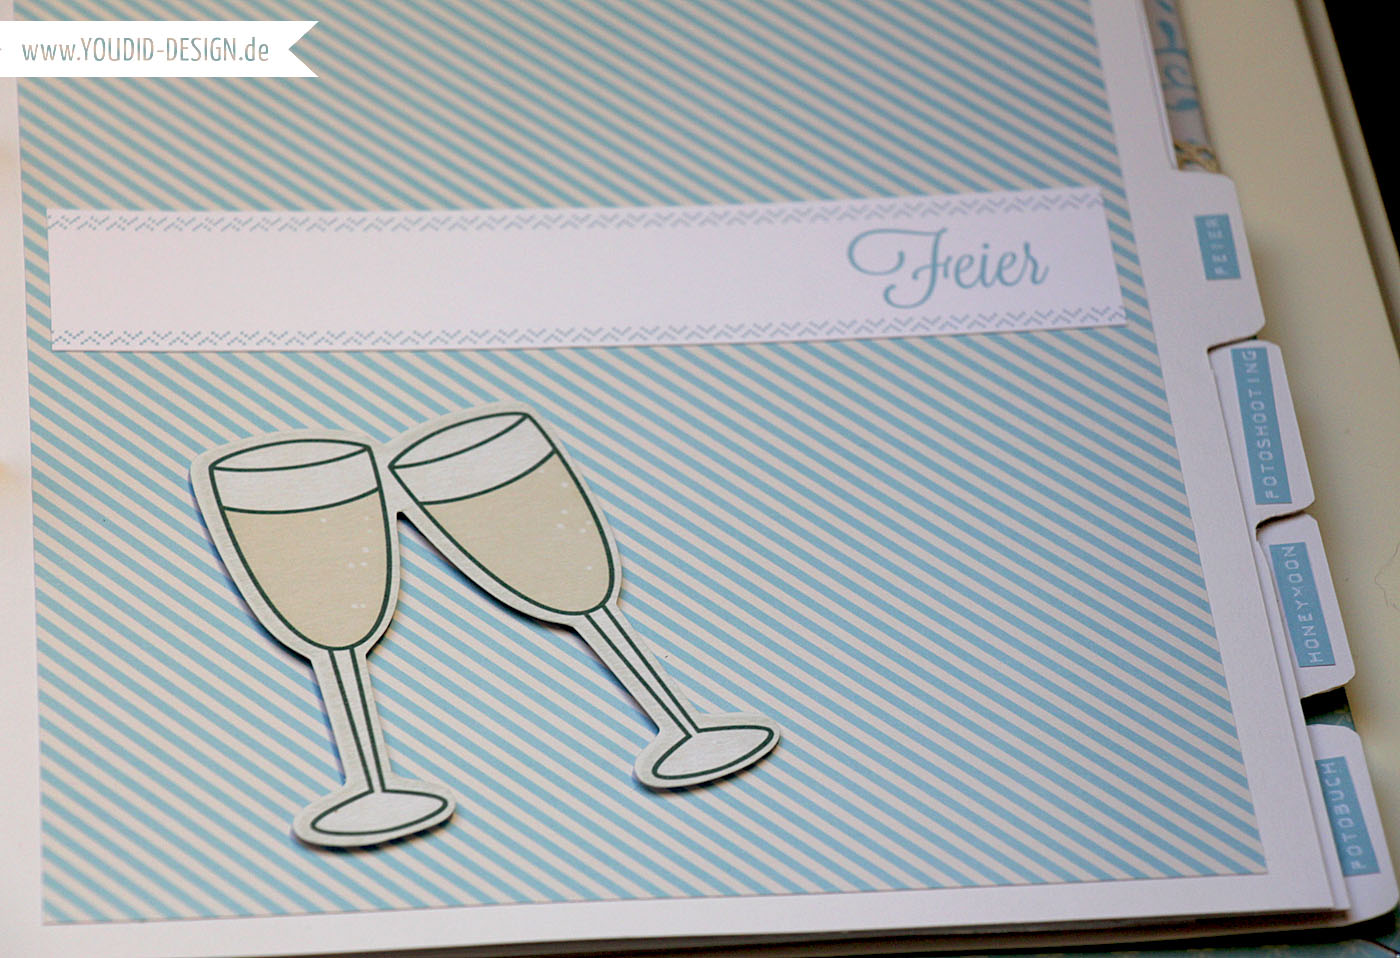 Hochzeitsfeier planen| www.youdid-design.de